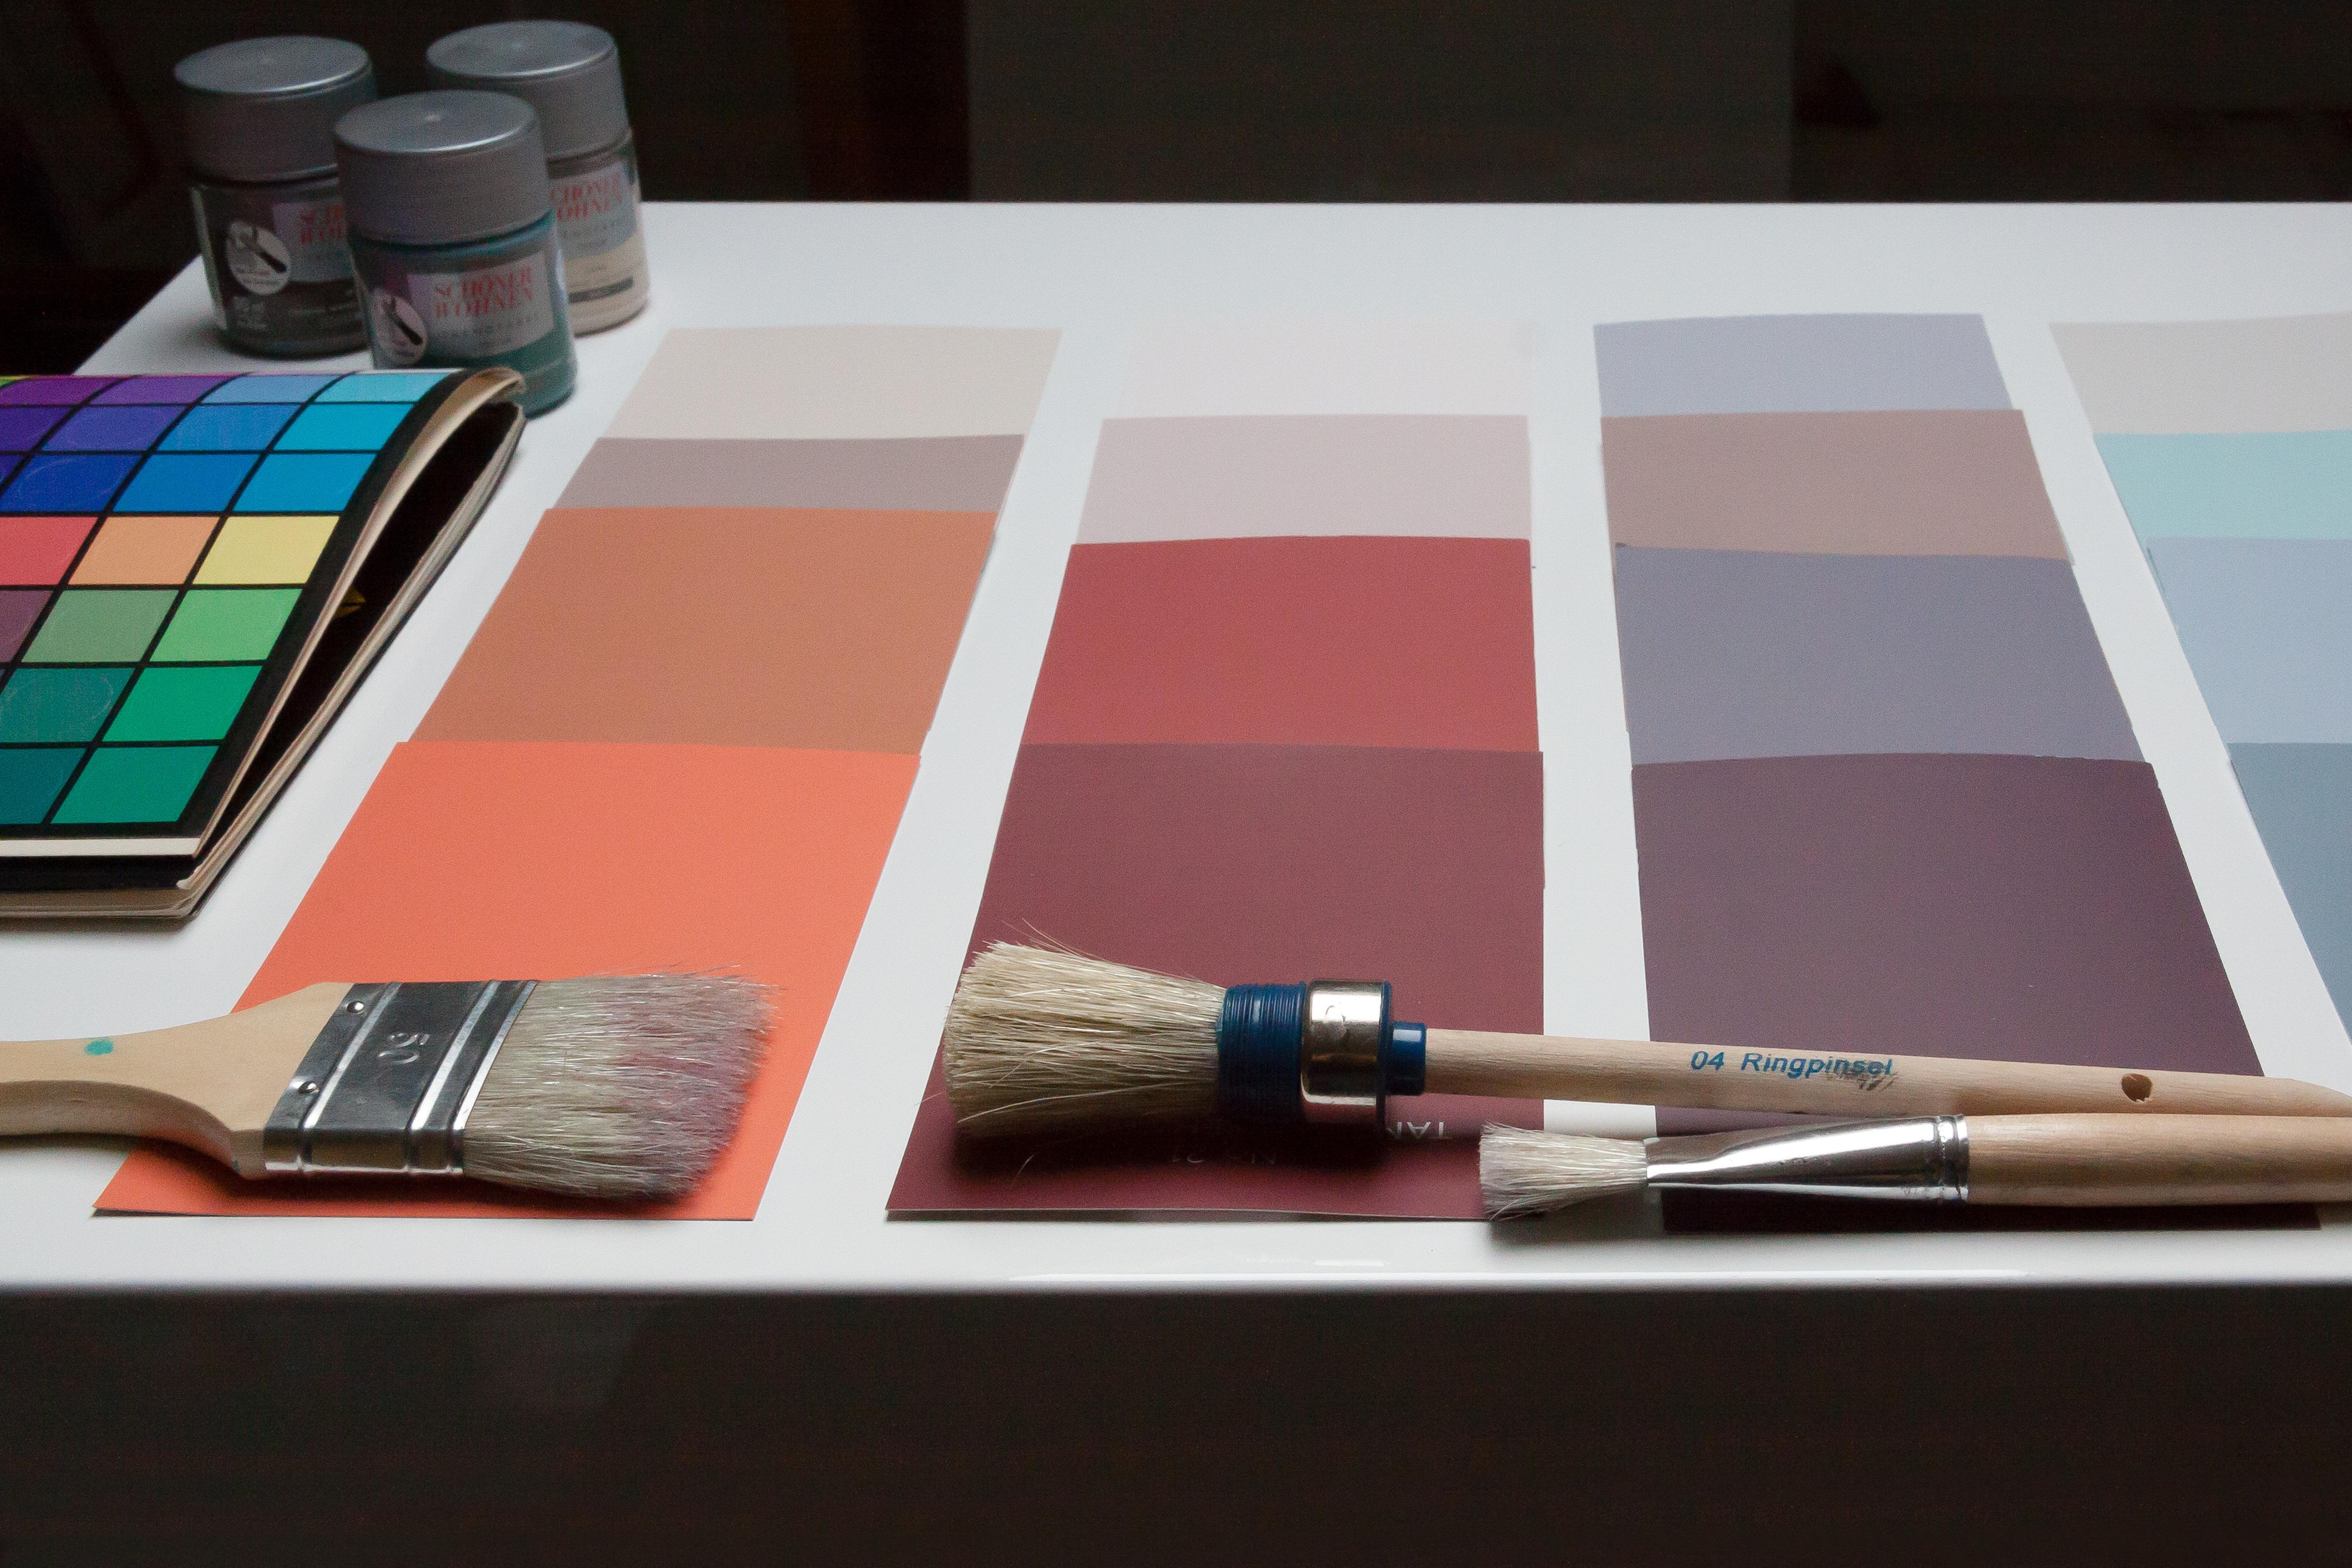 writing wood floor color interior design brand art painter decision design shape flooring evaluation color patterns - Shape In Interior Design